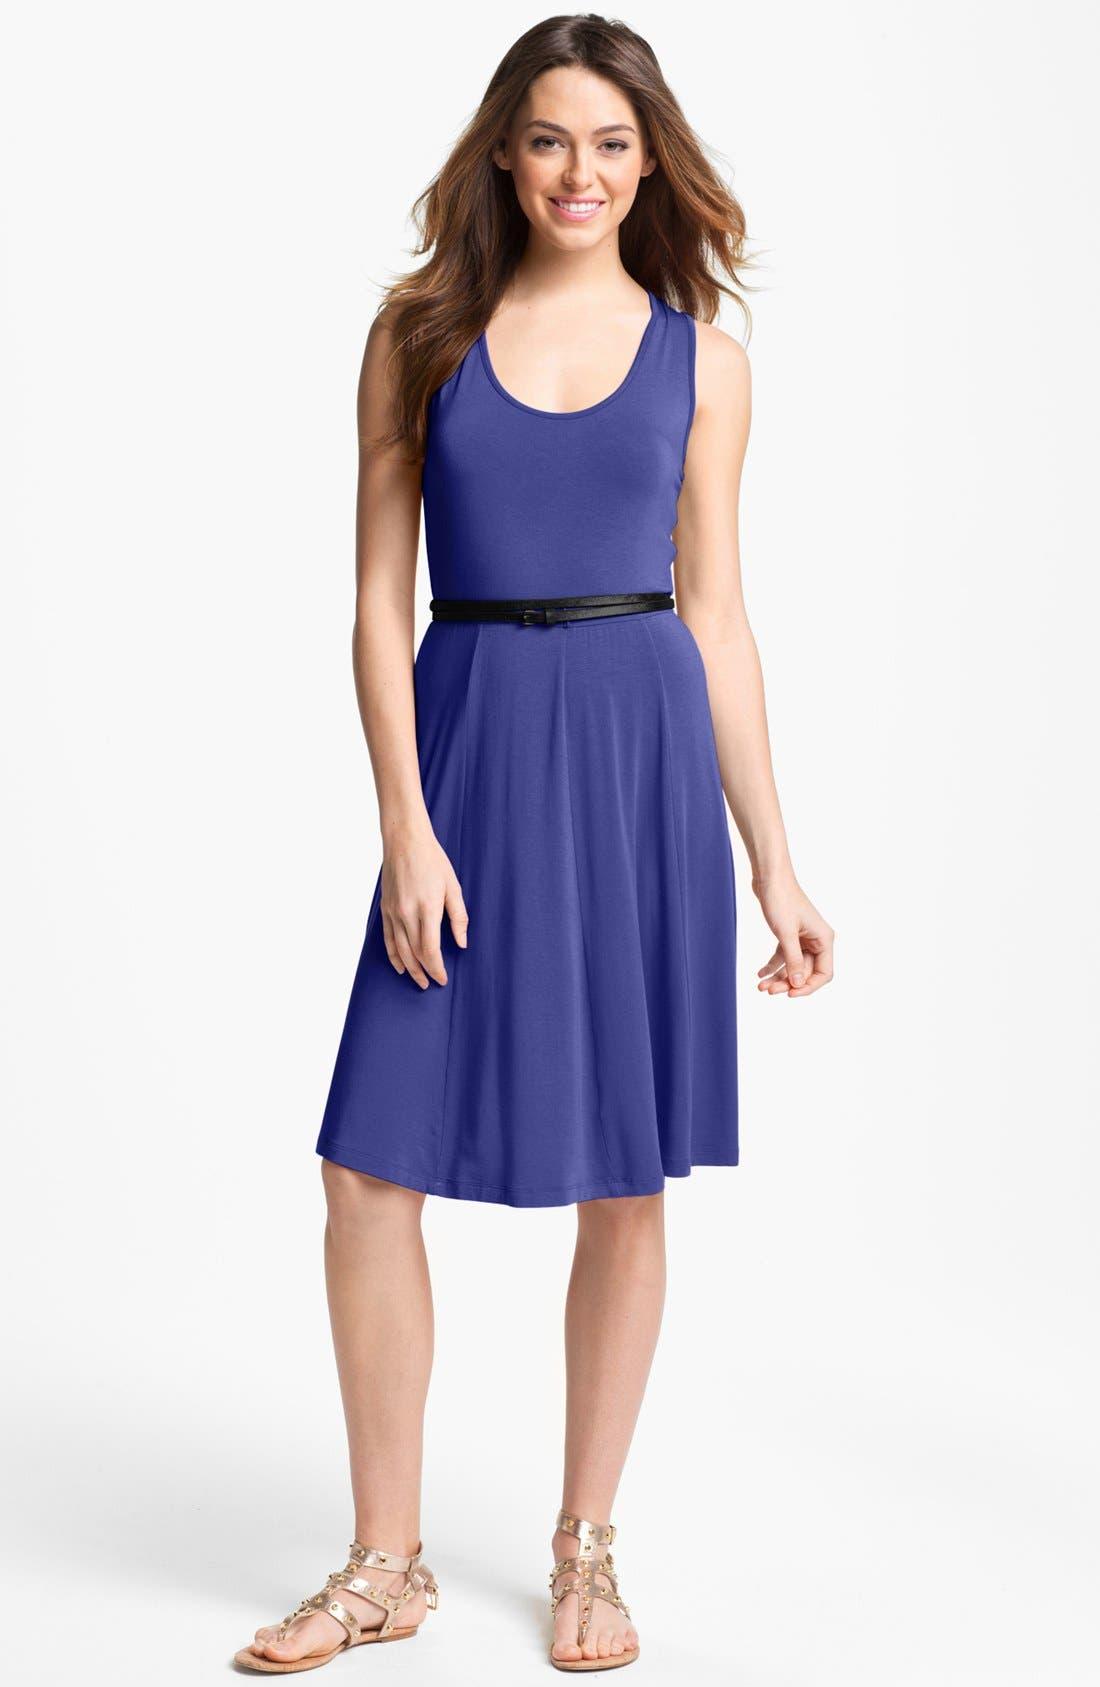 Alternate Image 1 Selected - Calvin Klein Sleeveless A-Line Dress